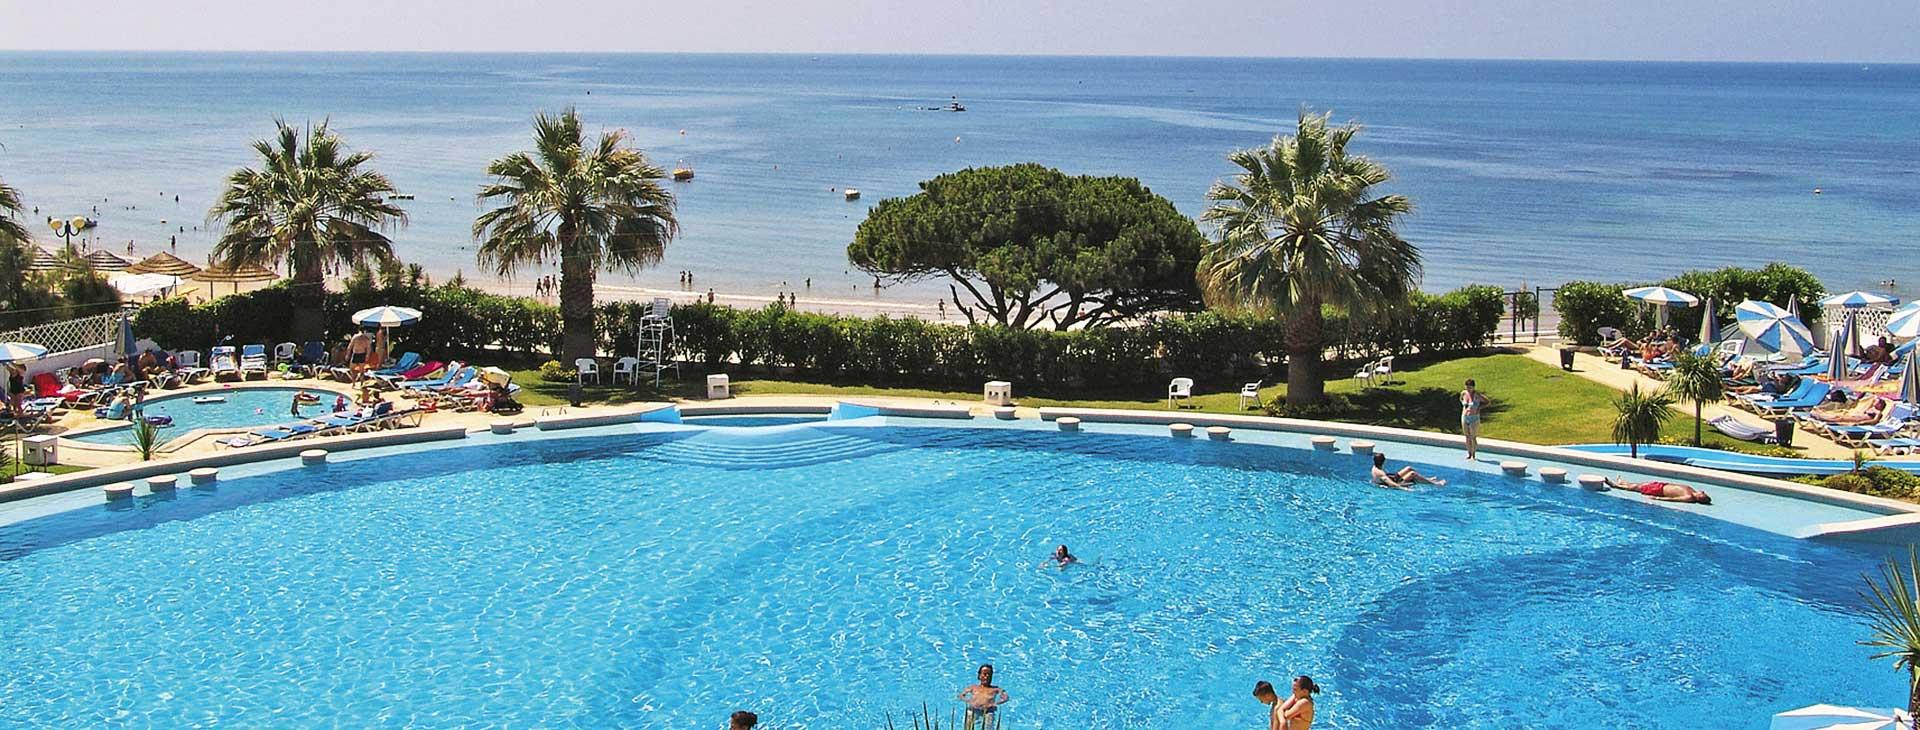 Oura View Beach Club Hotel Albufeira